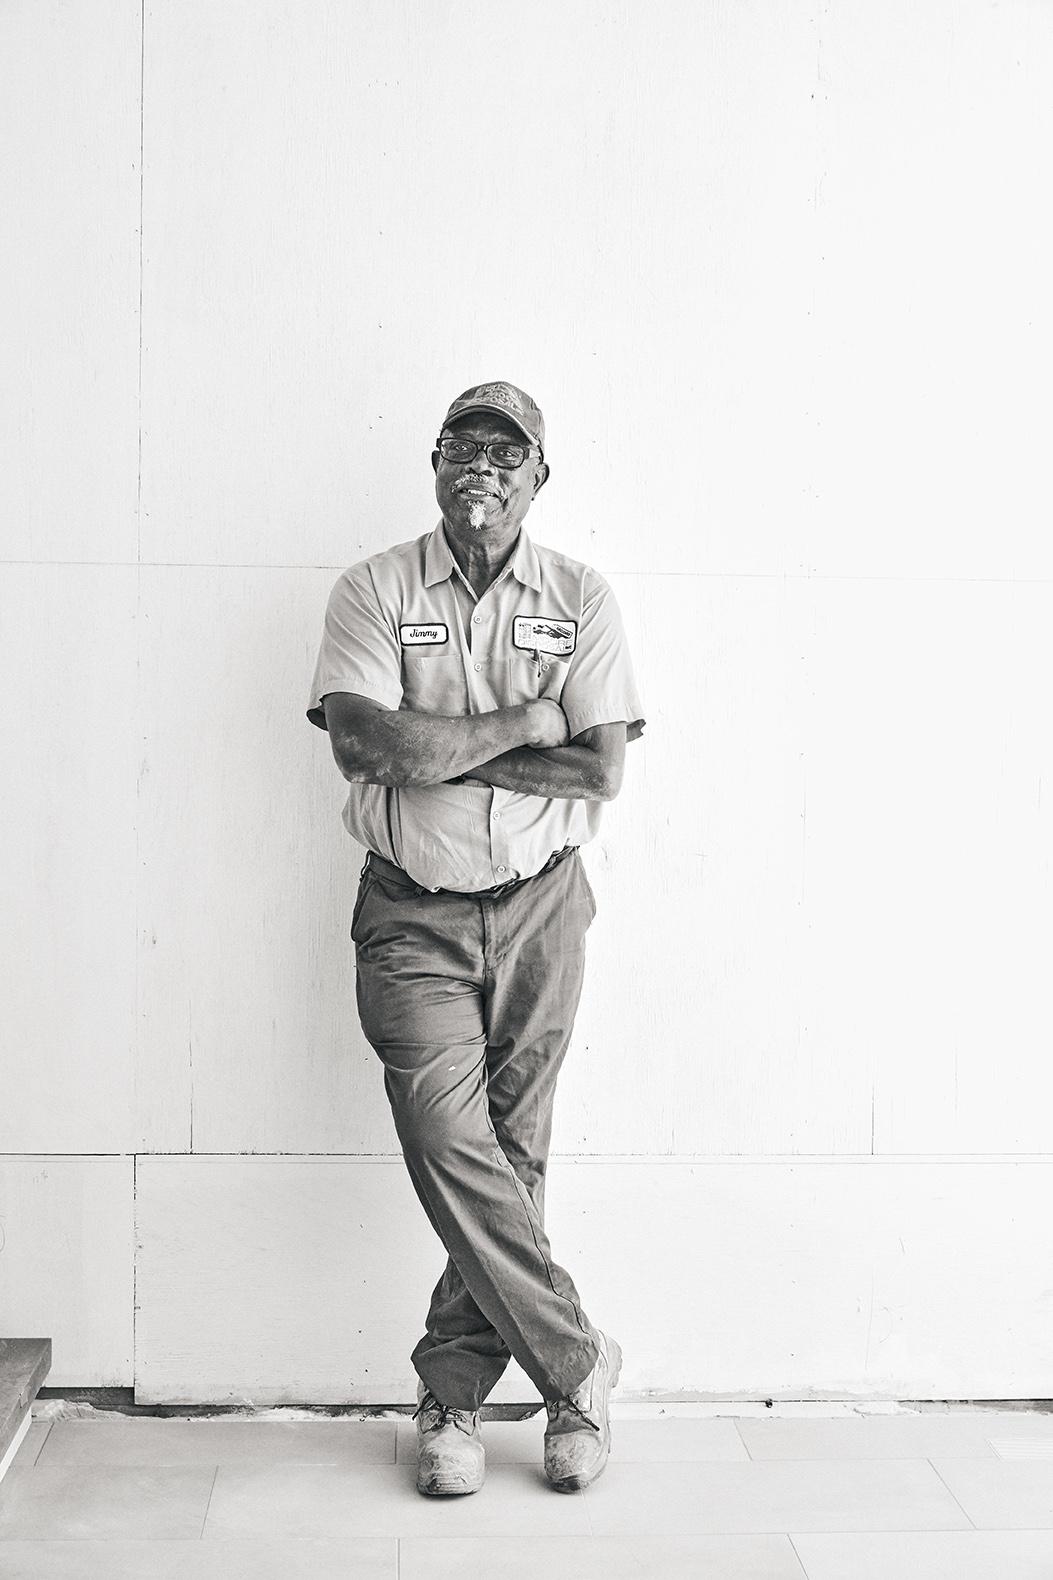 Jimmy Washington  |Moore Disposal  Truck Driver. 36 remarkable years at job.Loves the Cowboys and Bingo.